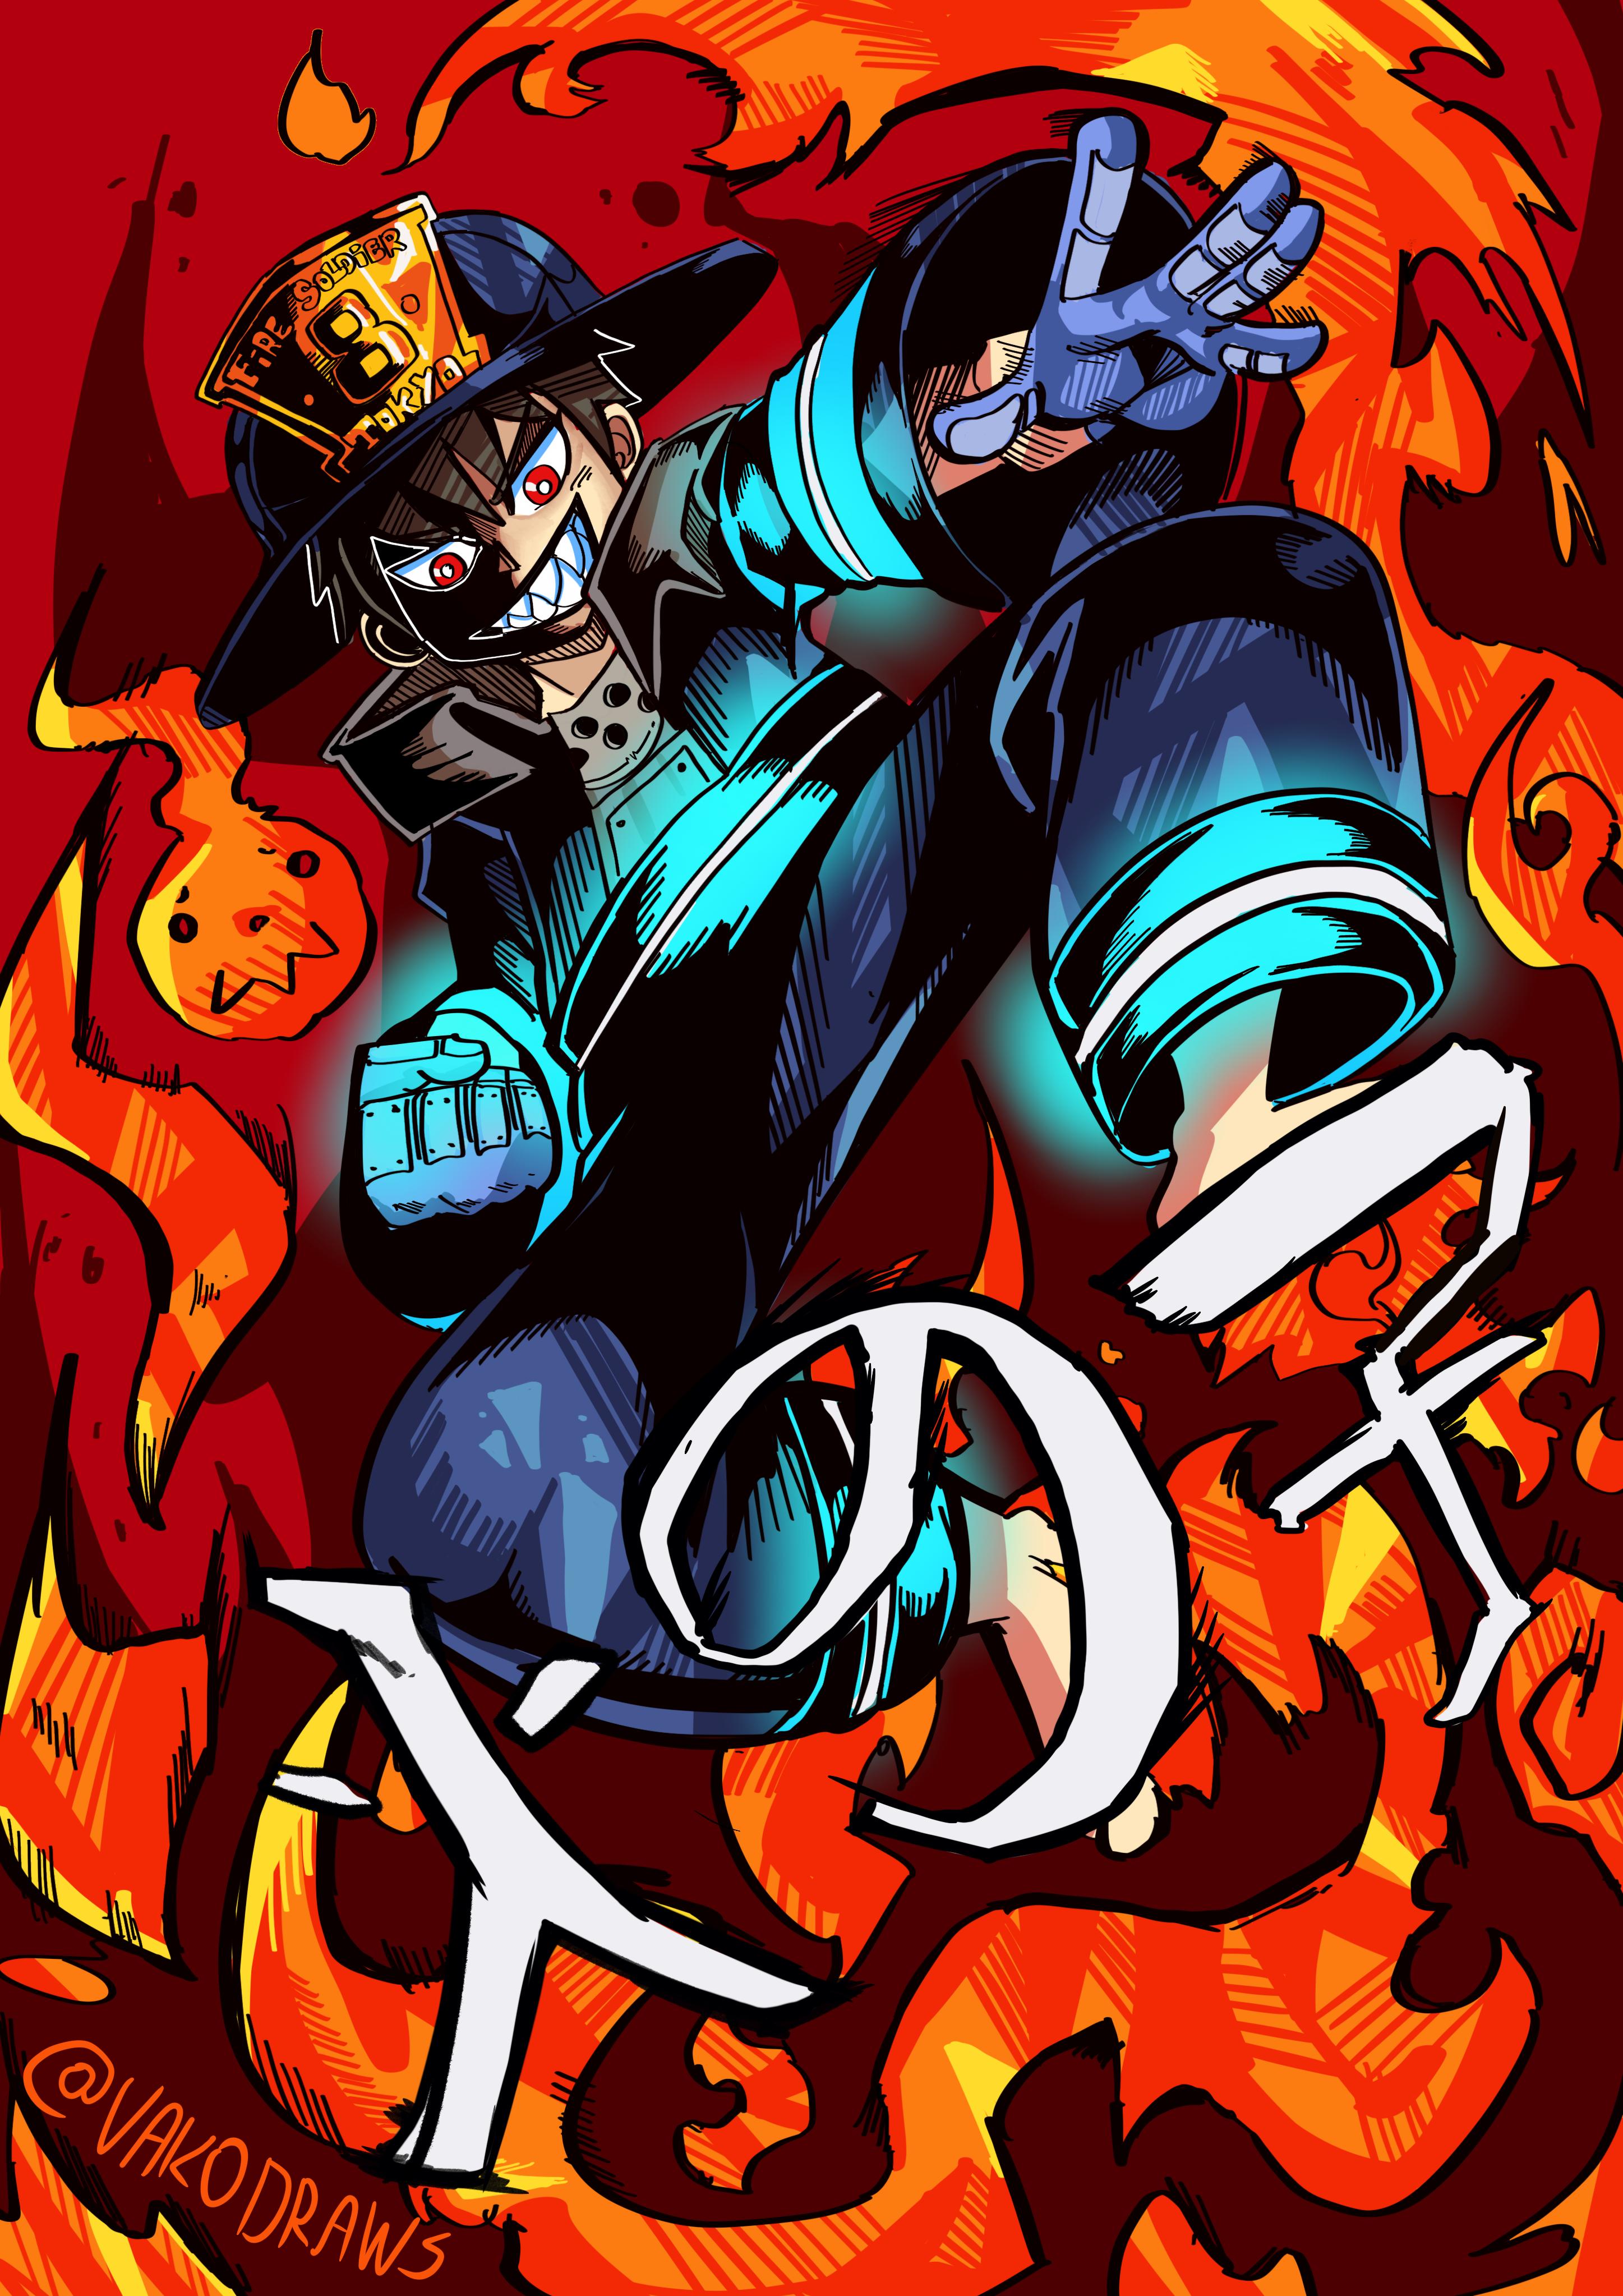 Shinra Fire Force !!